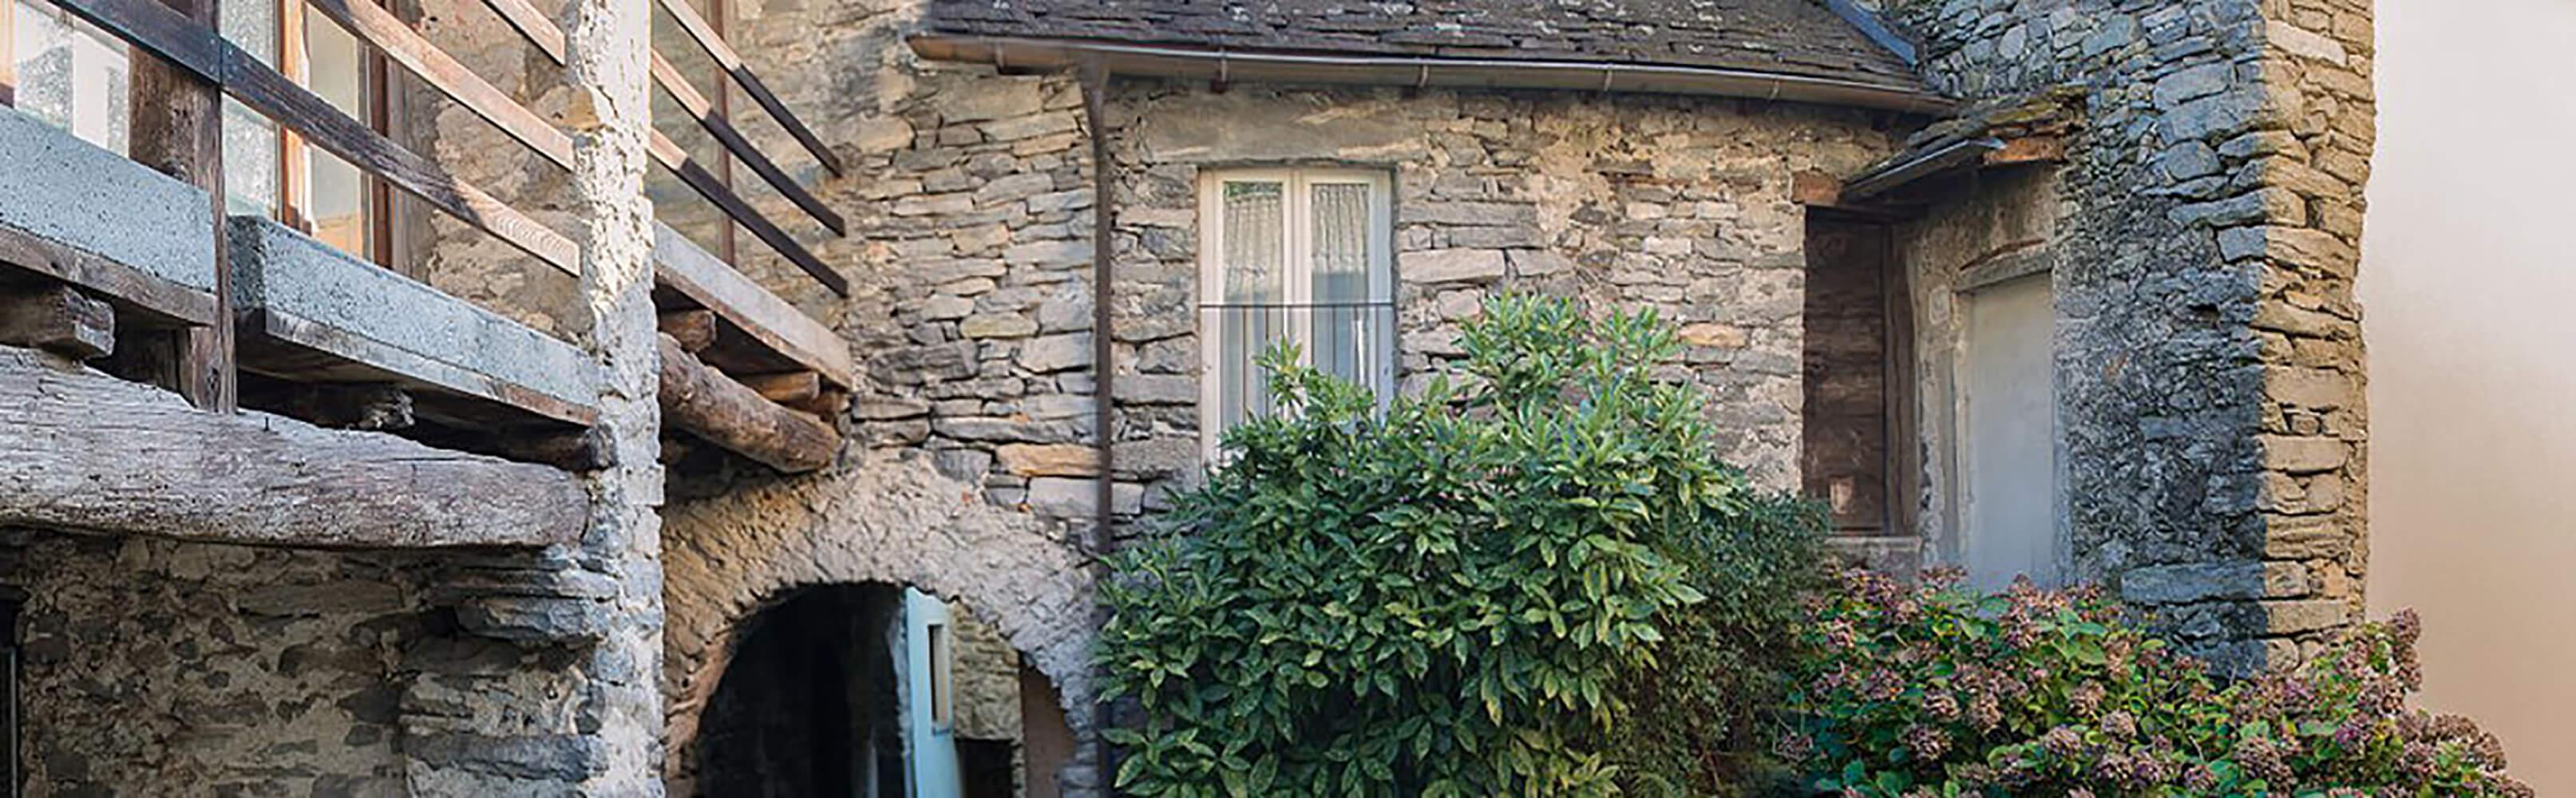 Casa Peri - Rustico im Tessin 1